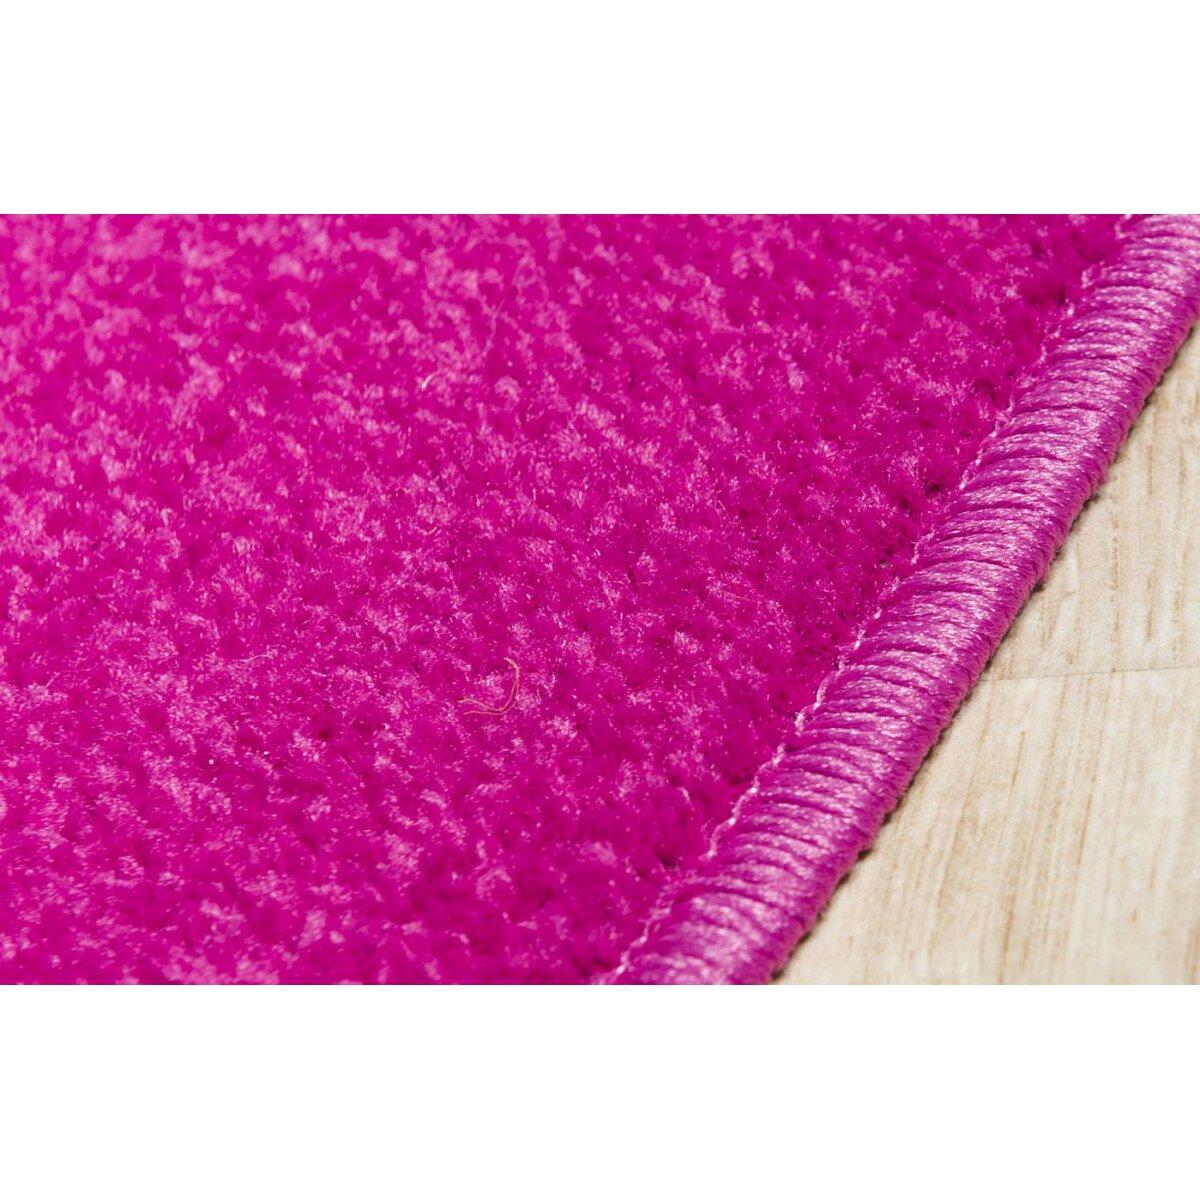 caracella teppich trend in pink bewertungen. Black Bedroom Furniture Sets. Home Design Ideas